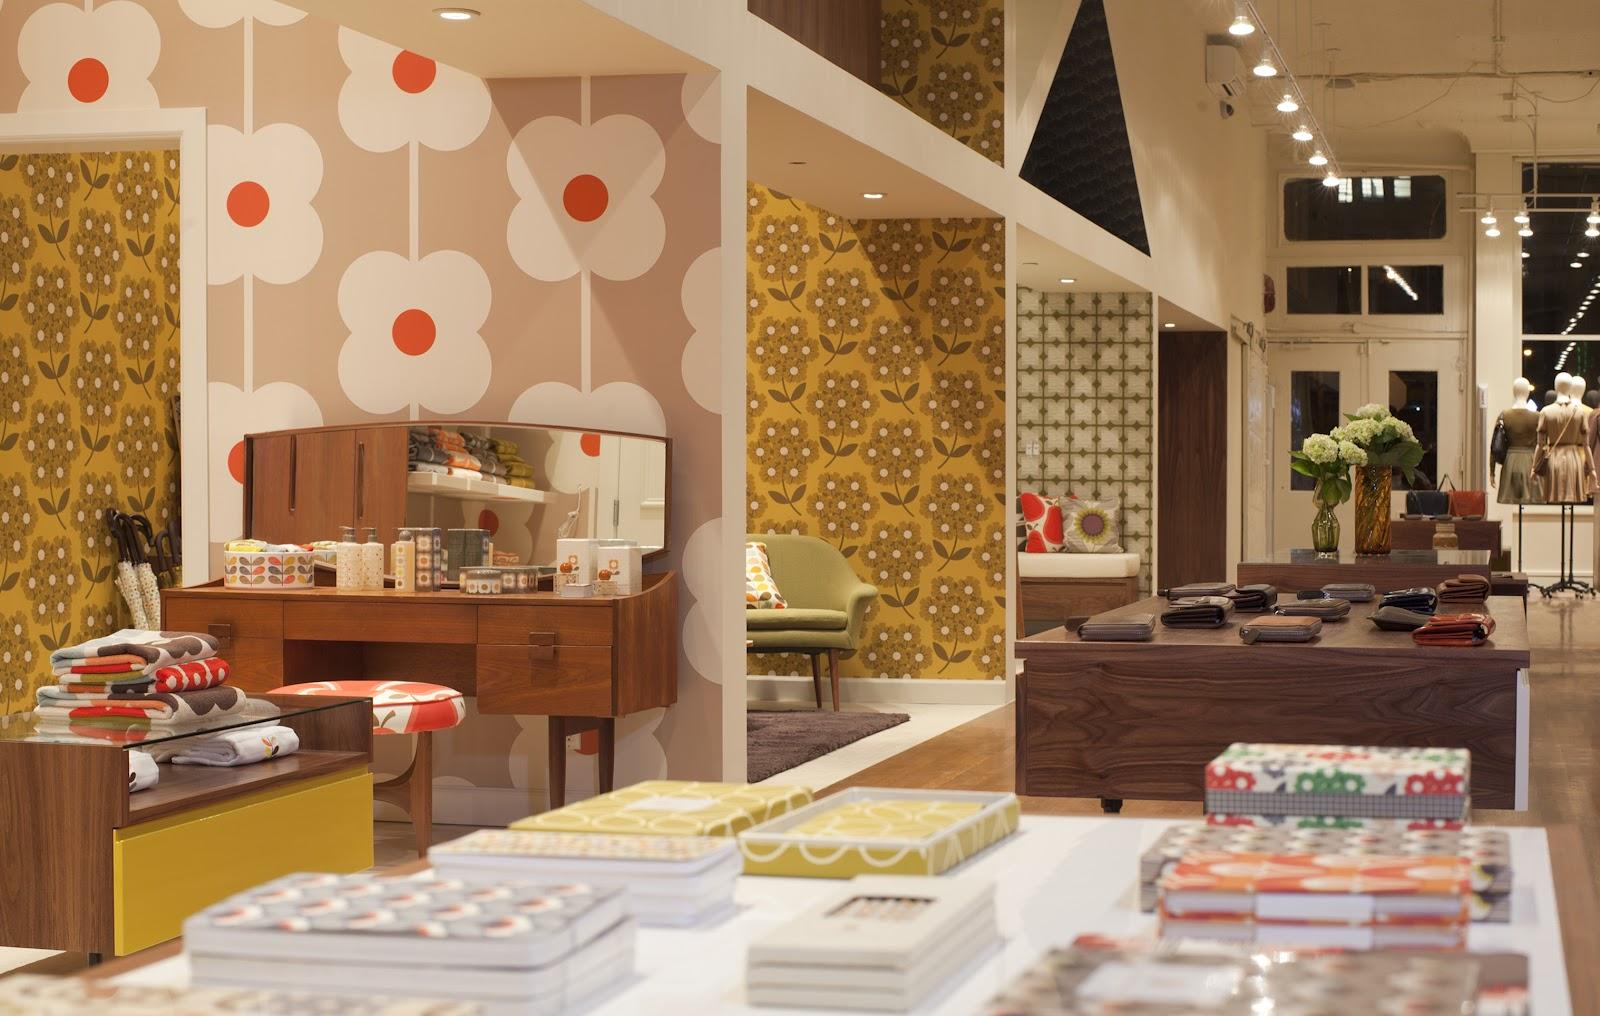 Shop Interior Design Orla Kiely Mercer Street New York - Eastern-design-office-designed-the-mostip-shoe-shop